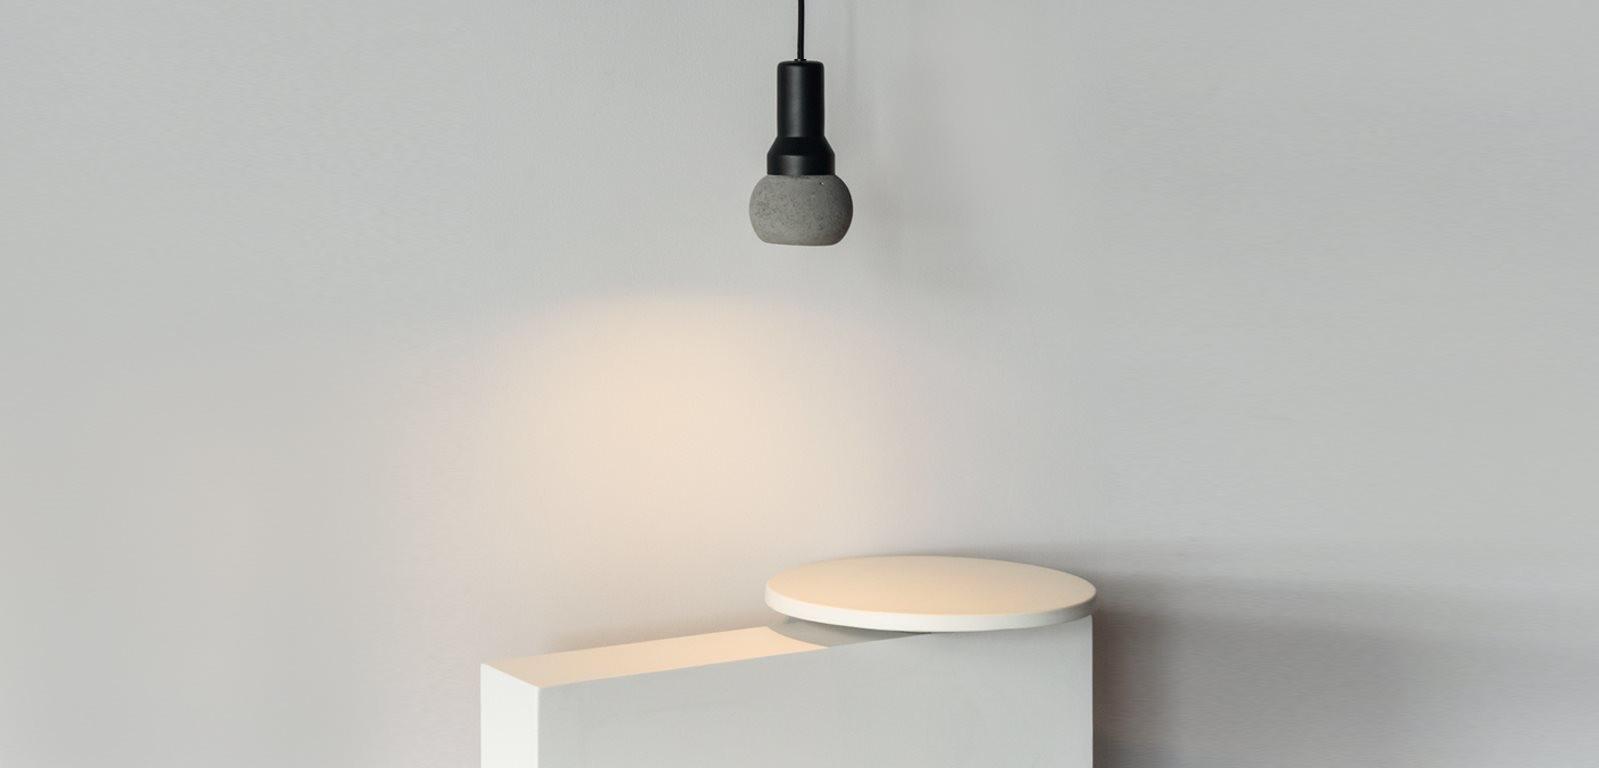 CL10-pendant-light-minimal-LED-spotlight-aluminium-brass-copper-concrete-white-black-cement-handmade-alentes